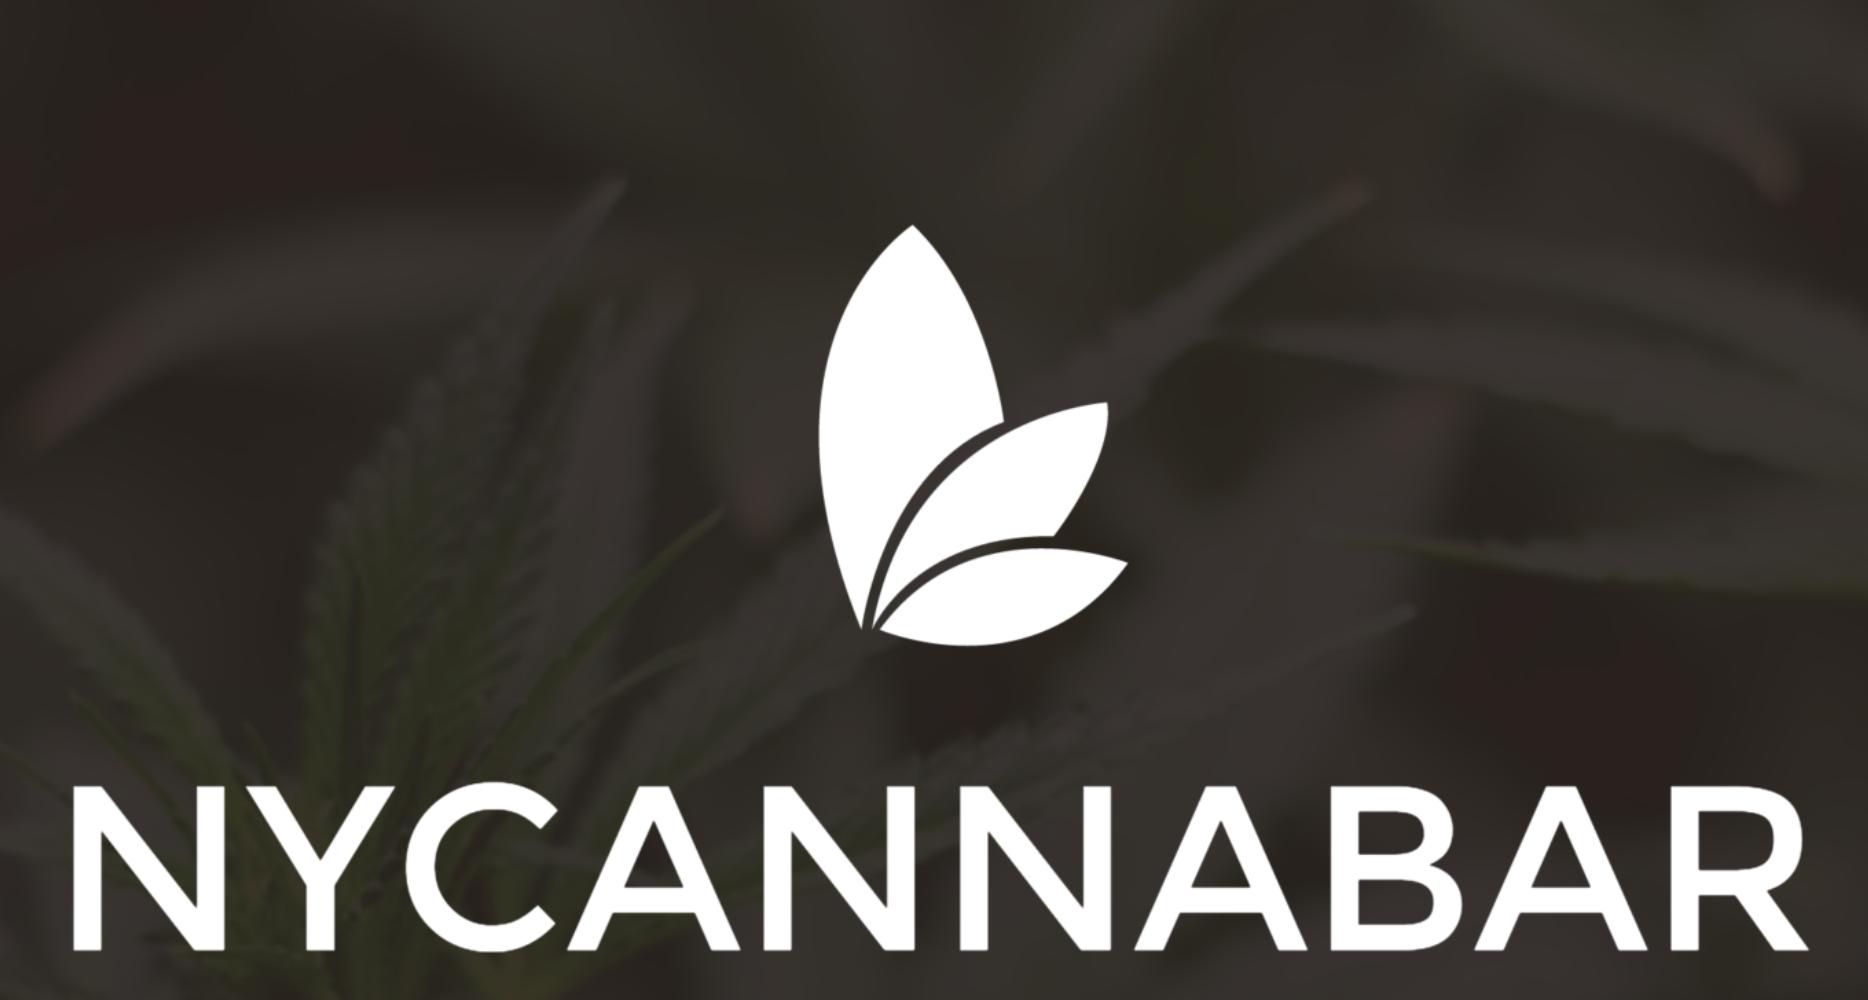 New York Cannabis Bar Association